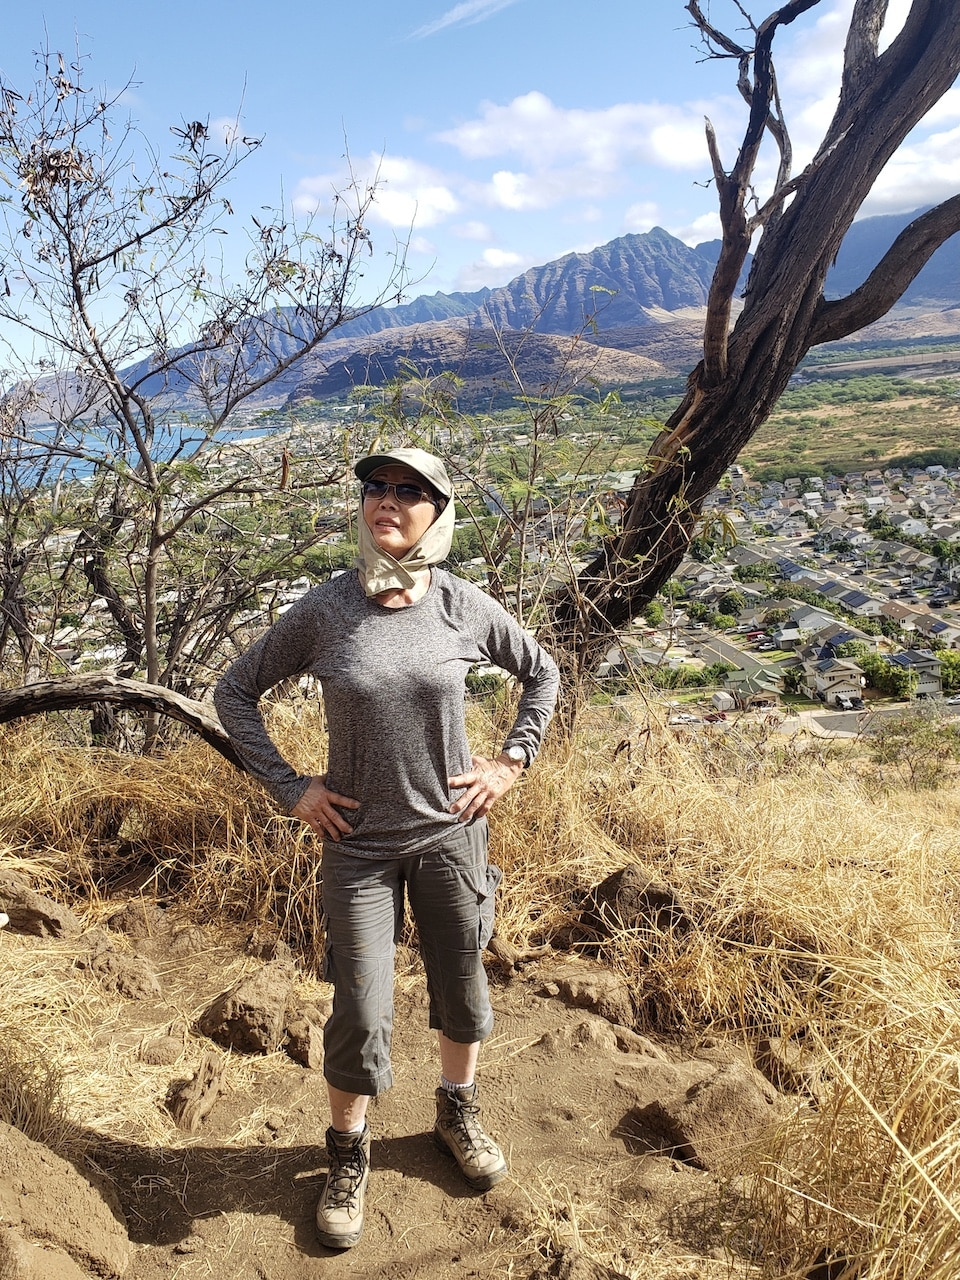 How about a 2 mile hike at the Kaiwa Ridge Trail in Oahu Hawaii